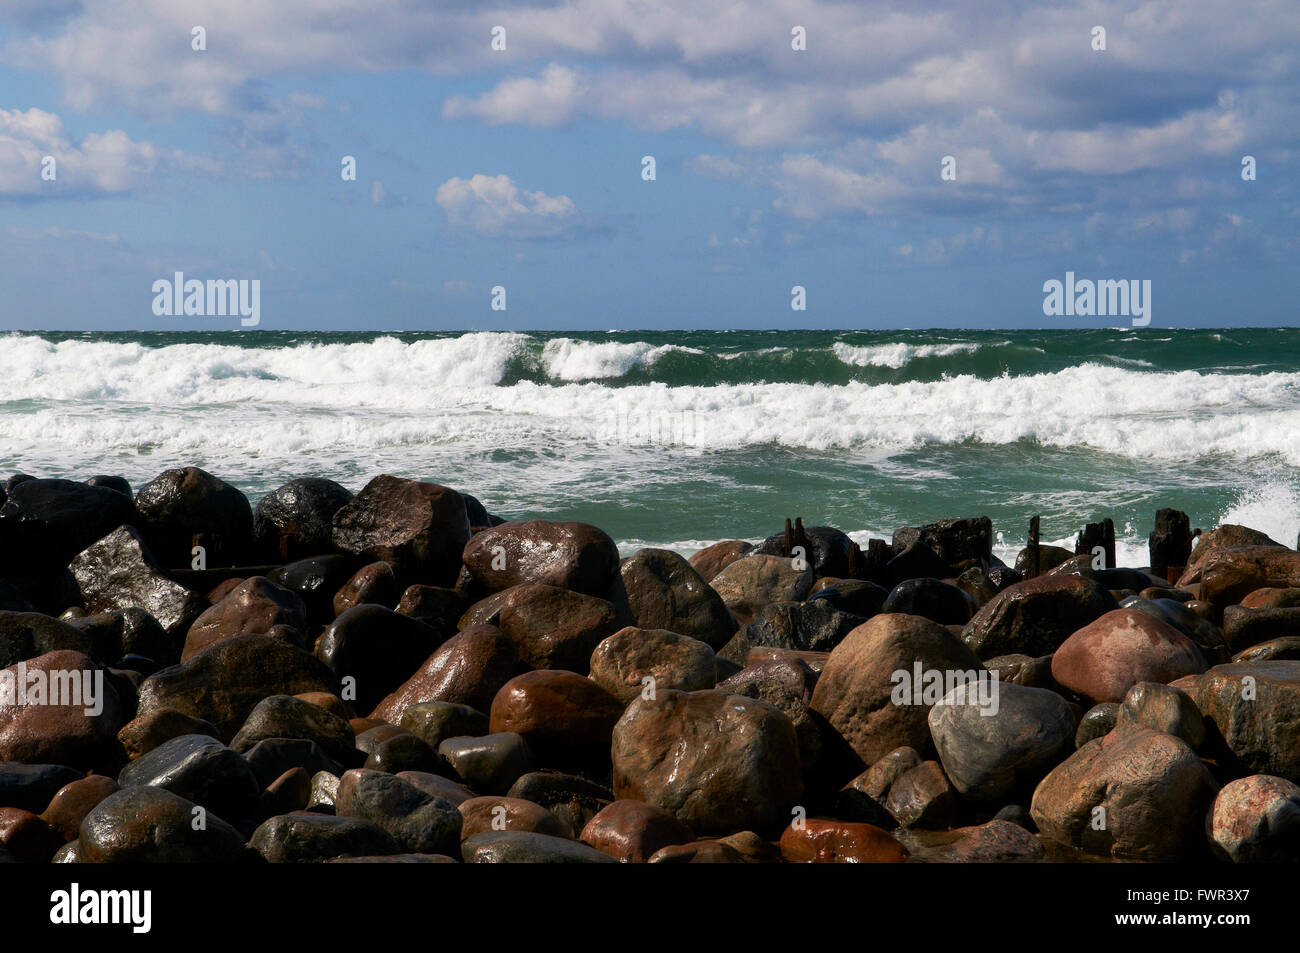 Beach at Tisvildeleje, Denmark - Stock Image